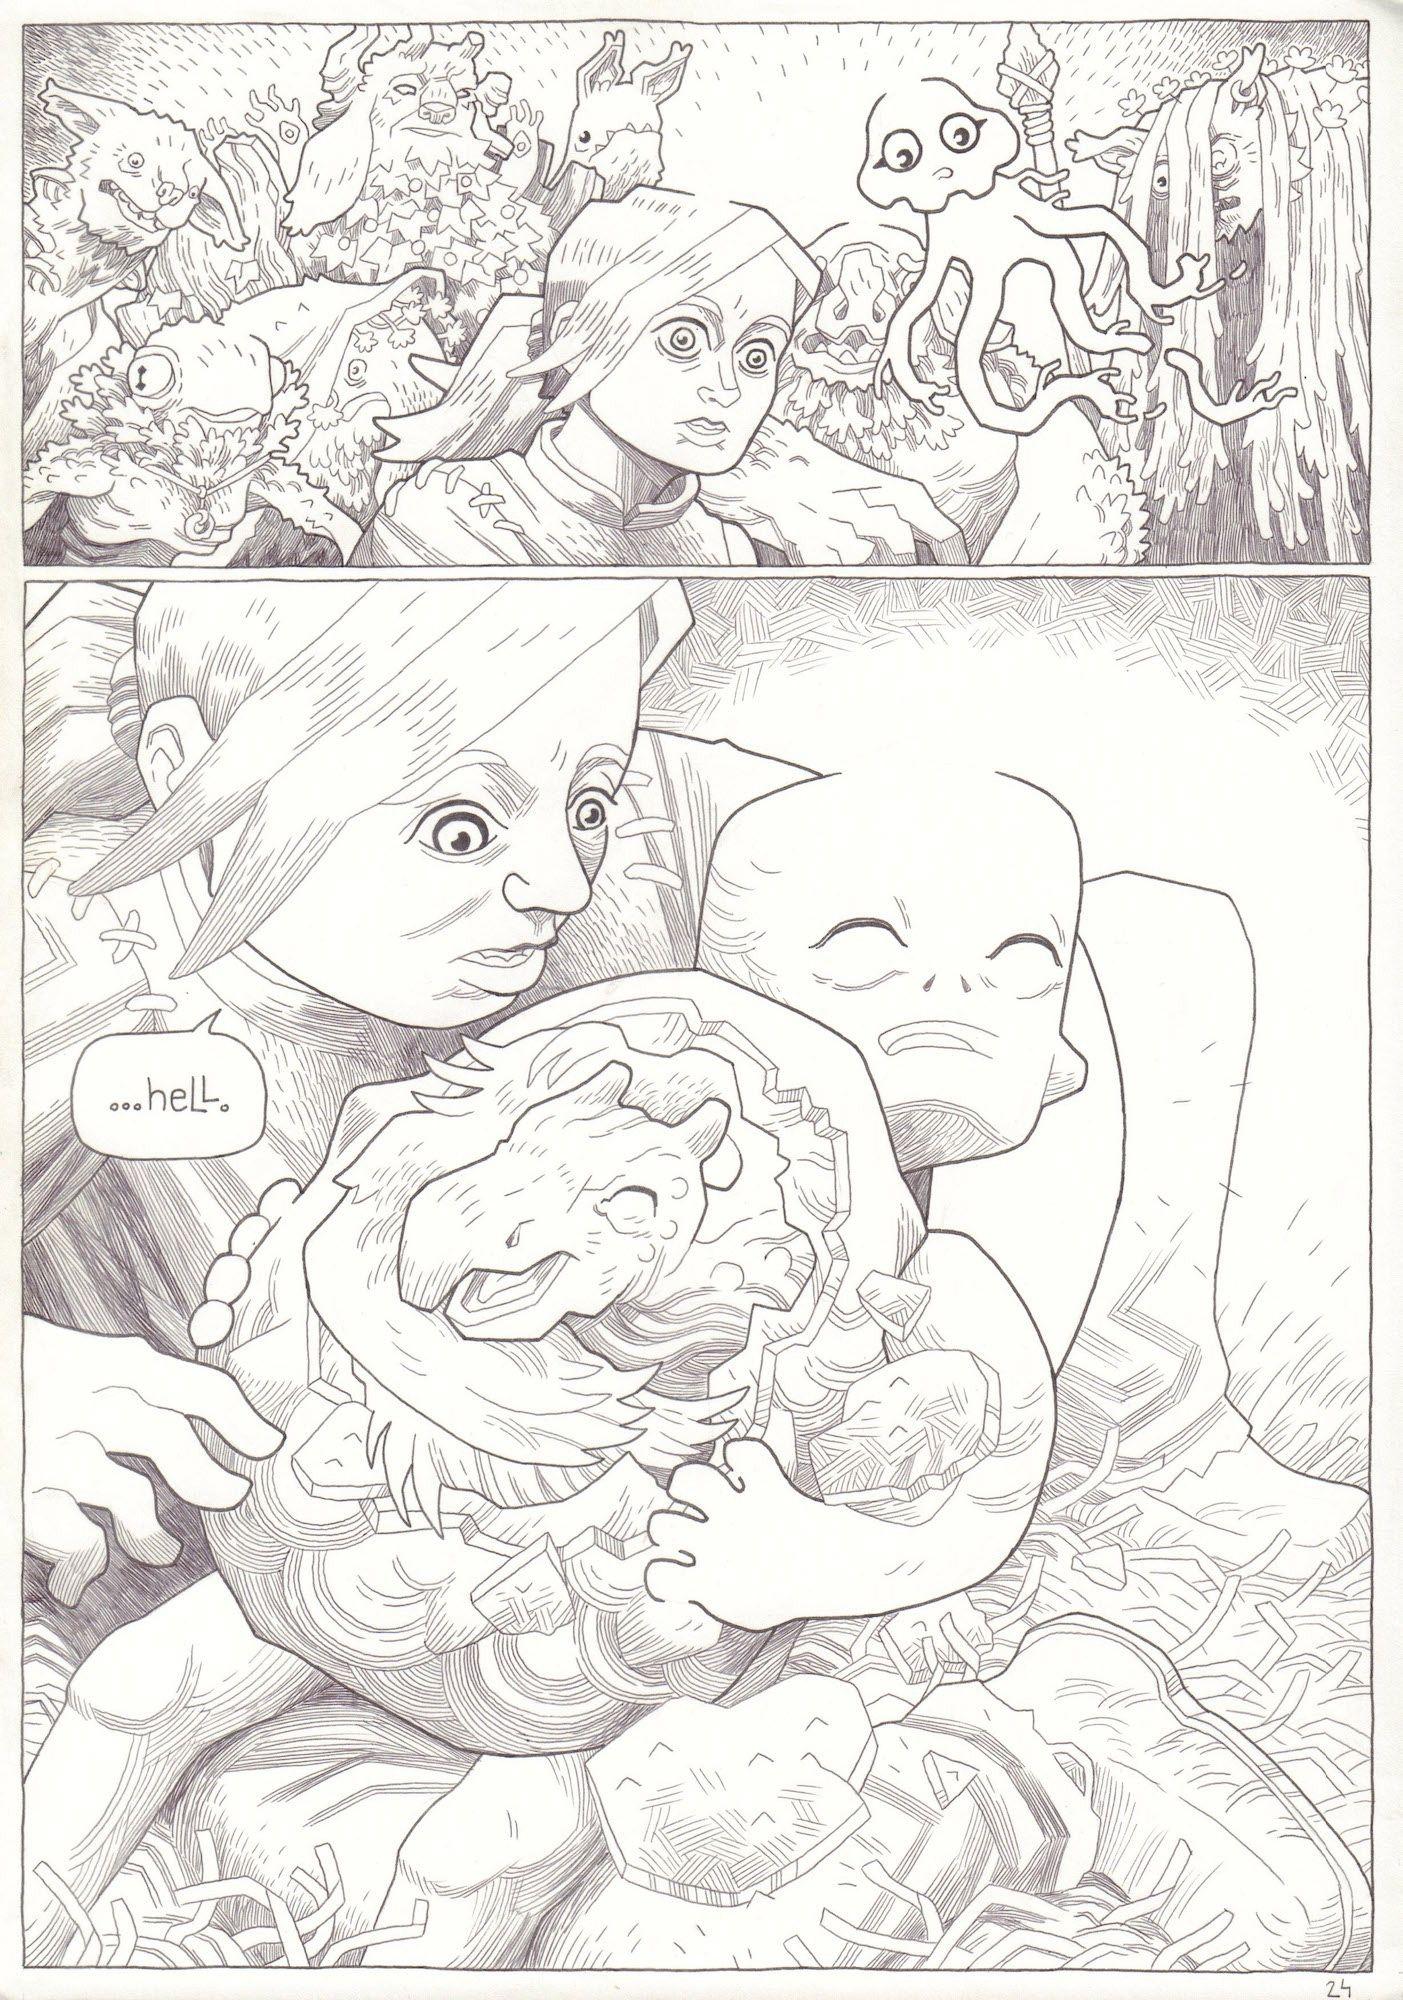 The Bloom Saga, s. 24